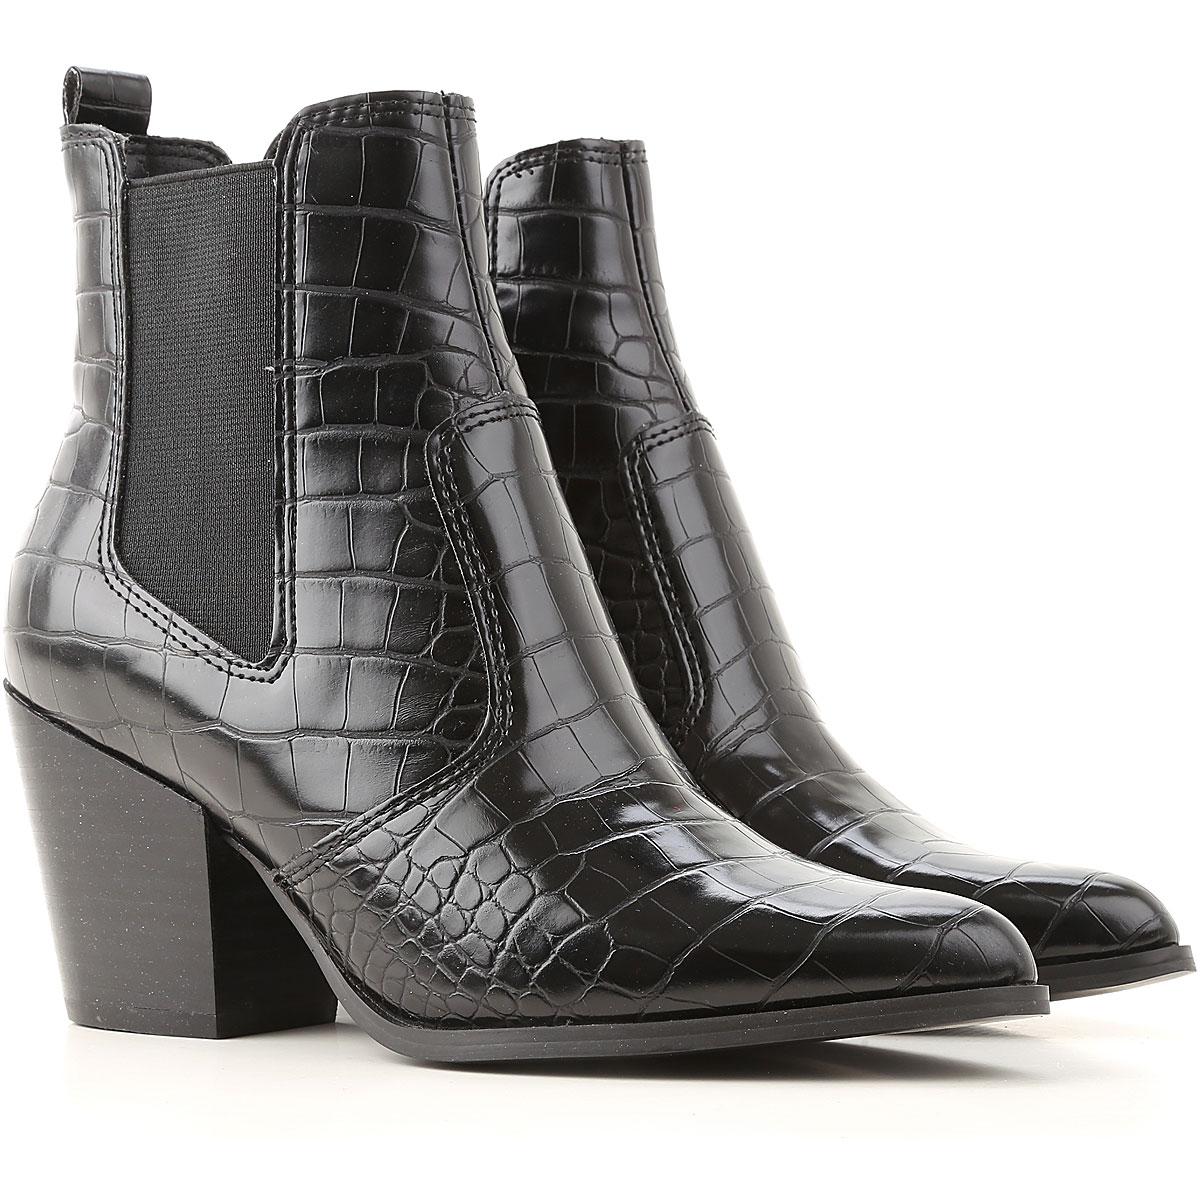 Steve Madden Shoes, Marcoo Studded Boot francescas